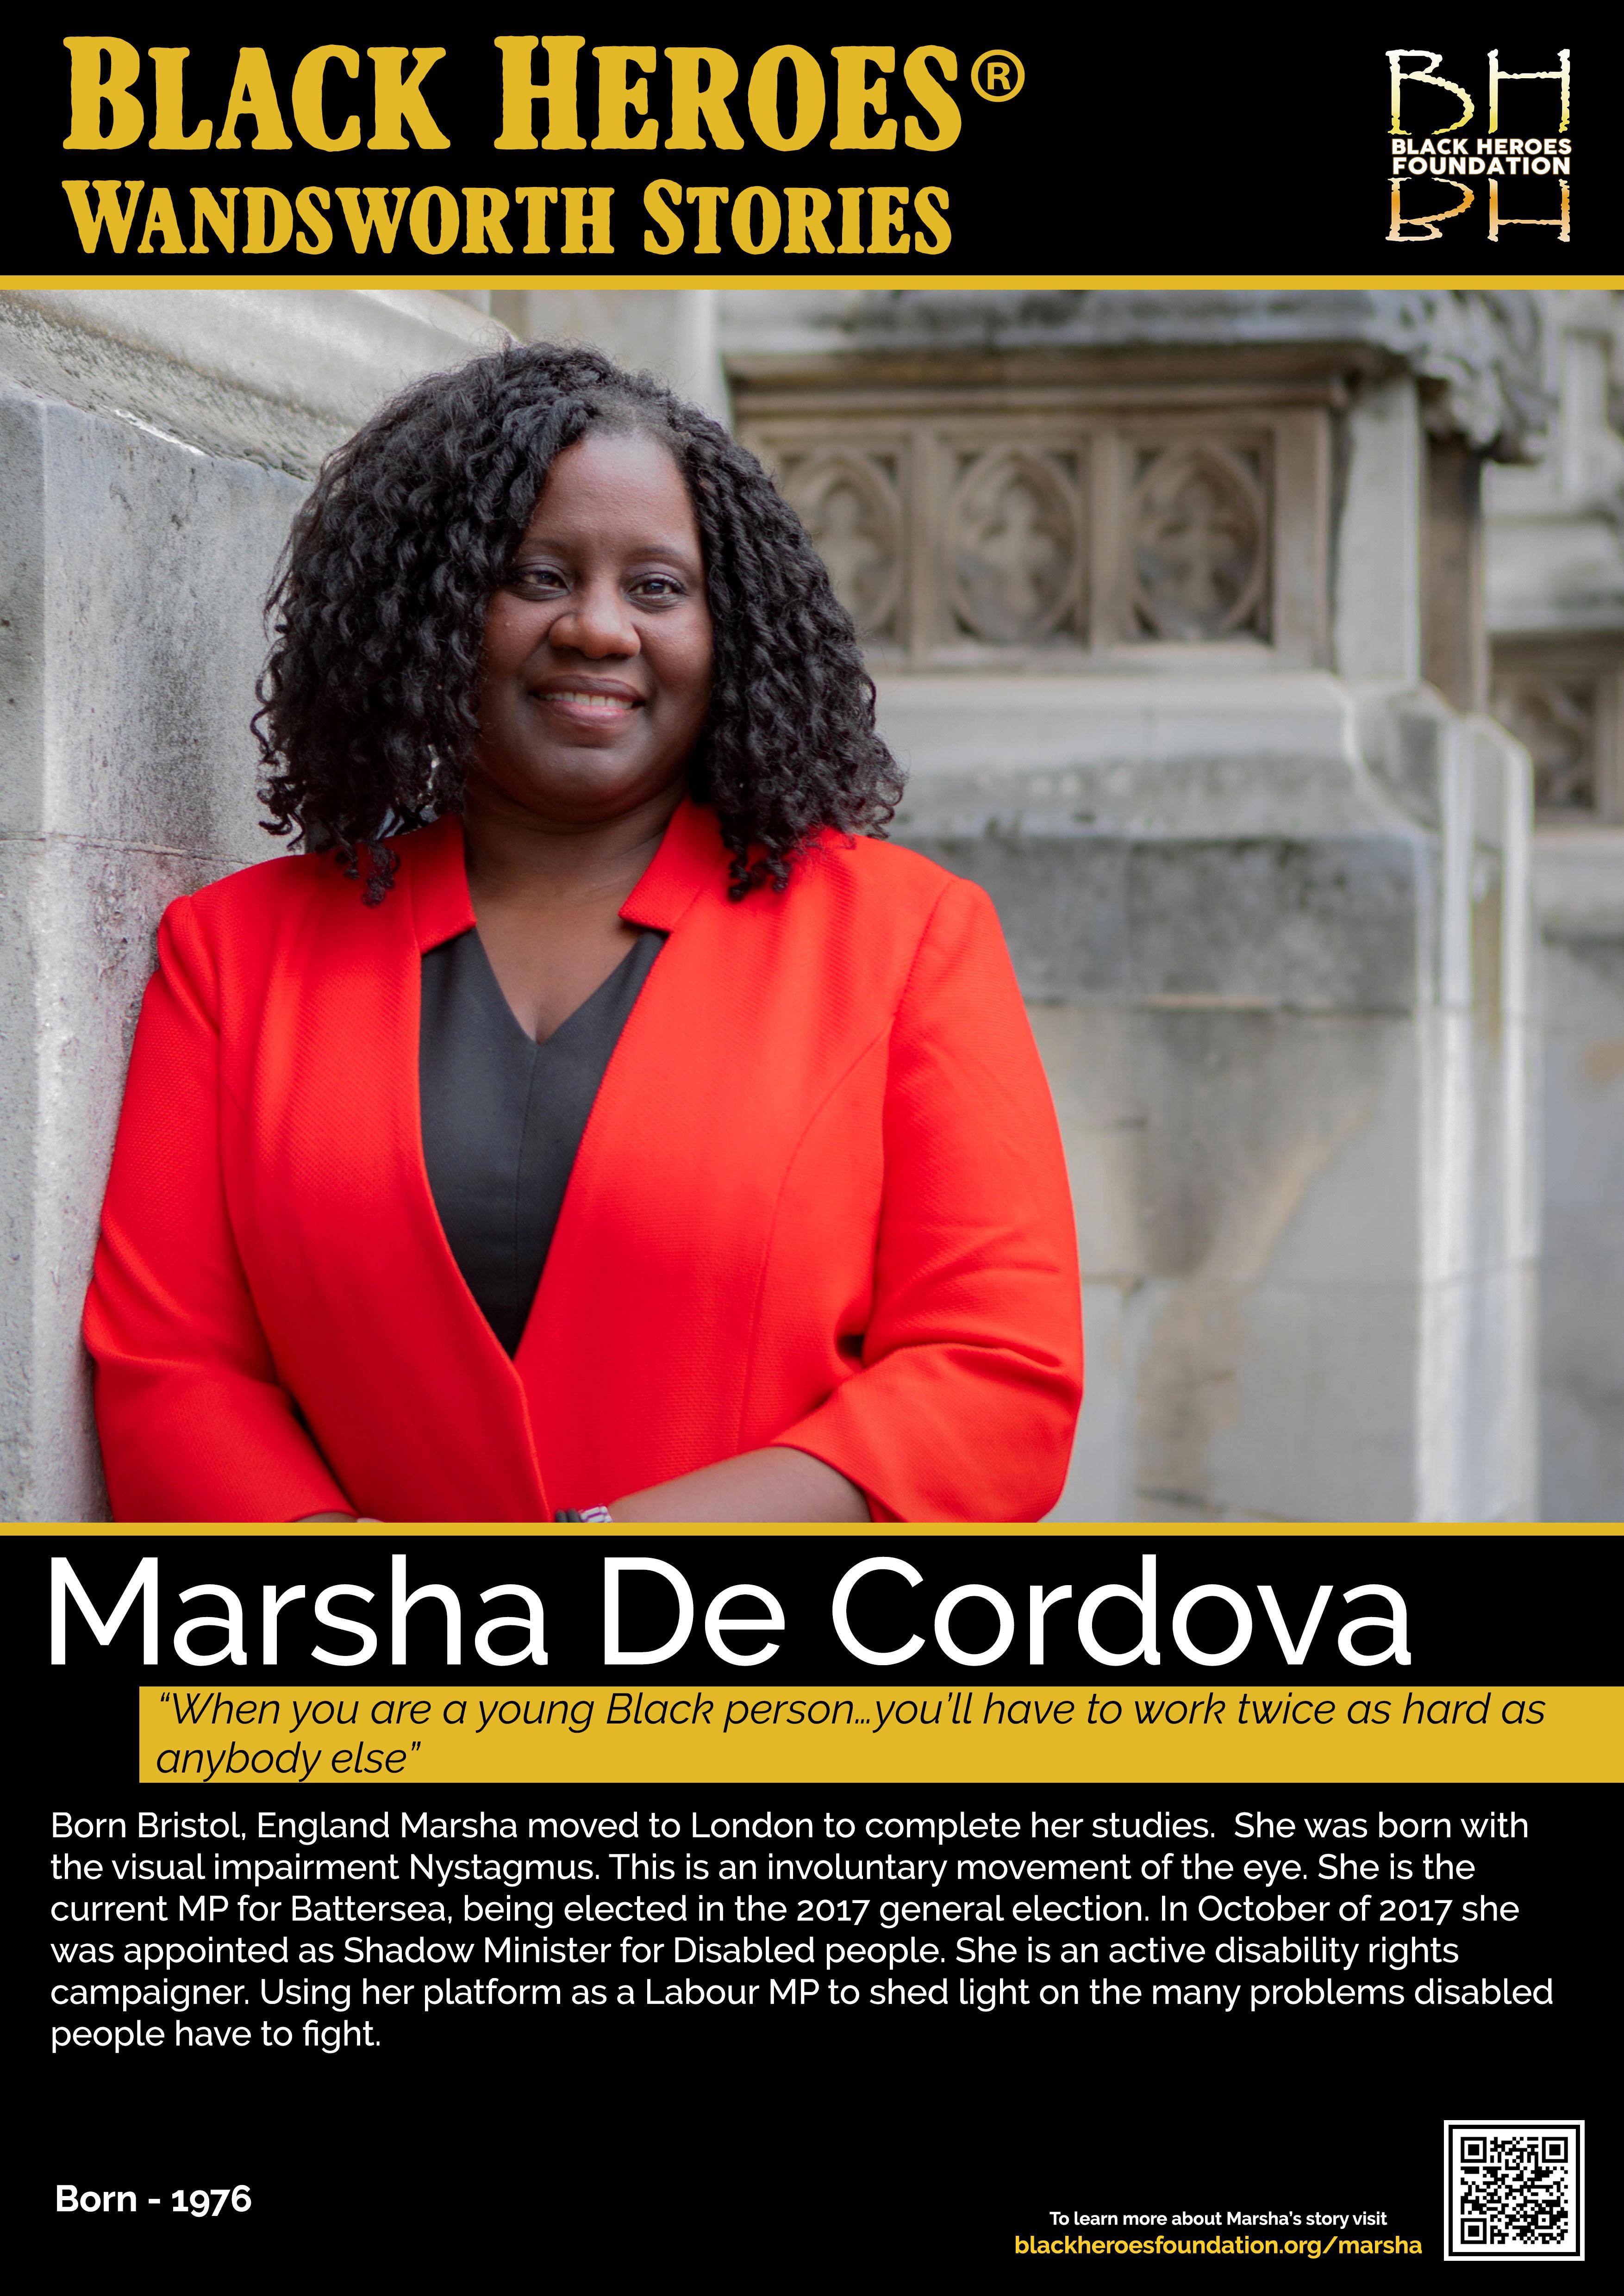 Marsha De Cordova Black Heroes Wandsworth Stories